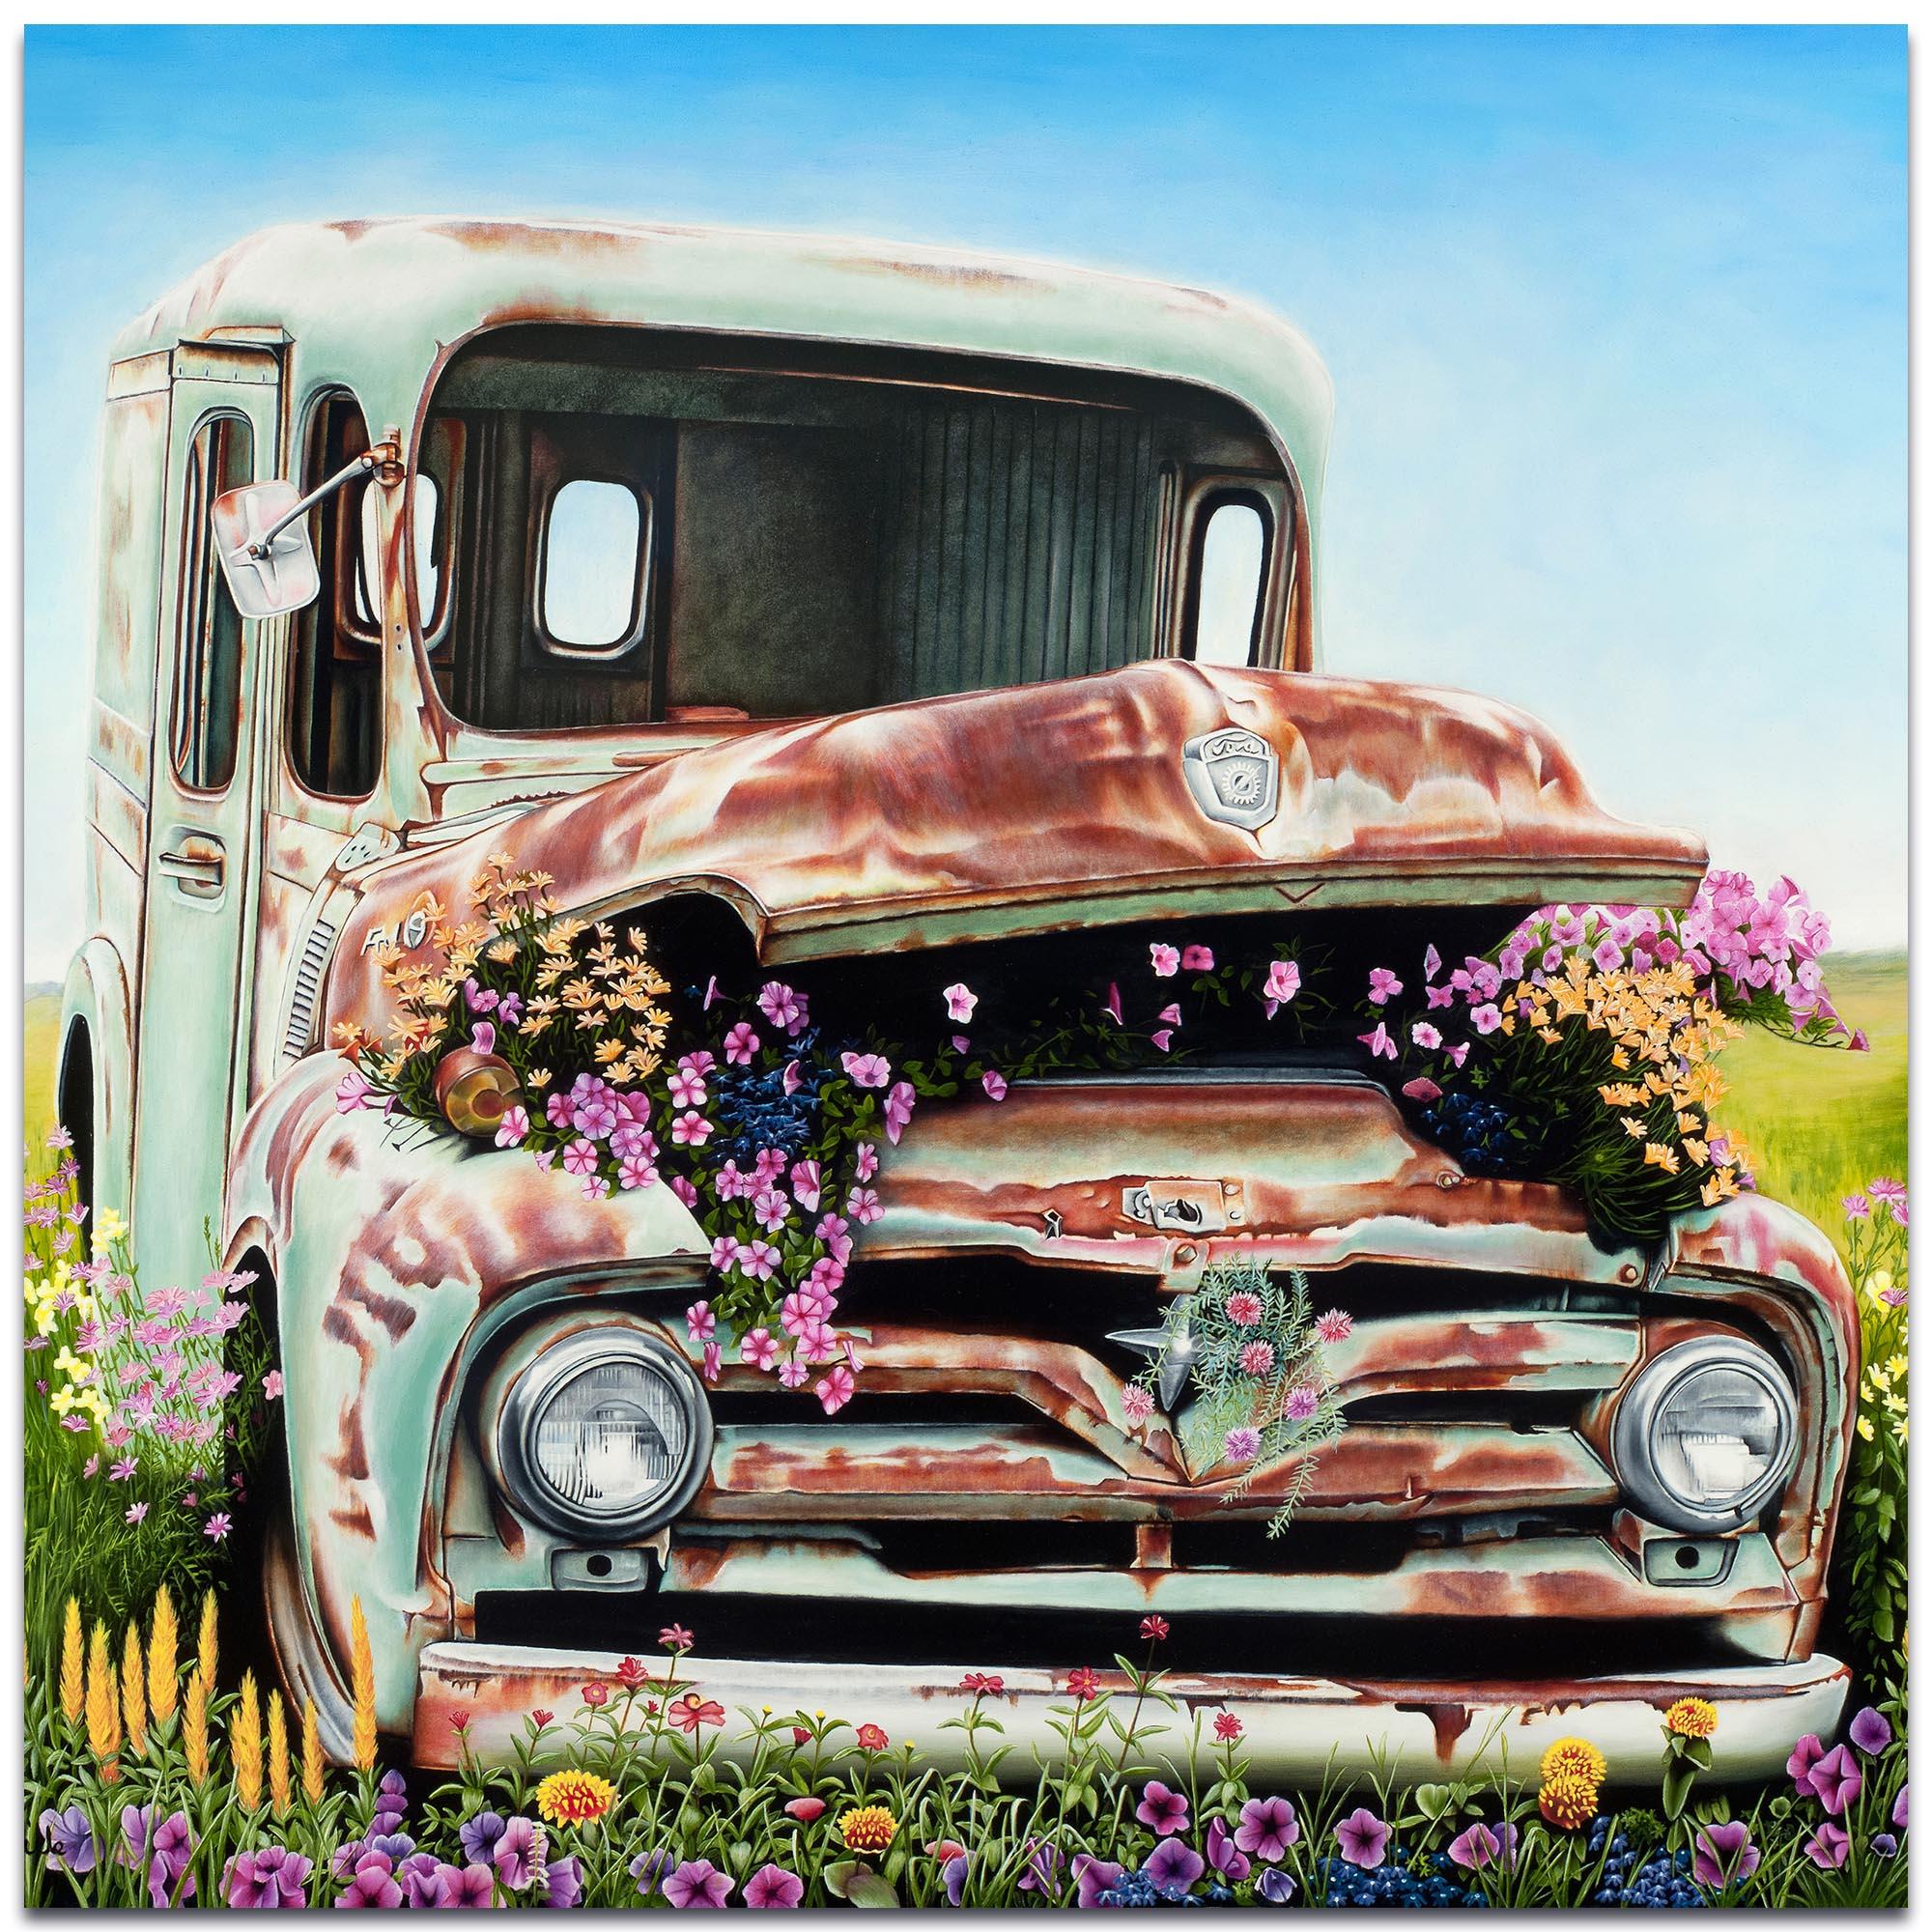 Americana Wall Art 'Got Flowers' - Classic Cars Decor on Metal or Plexiglass